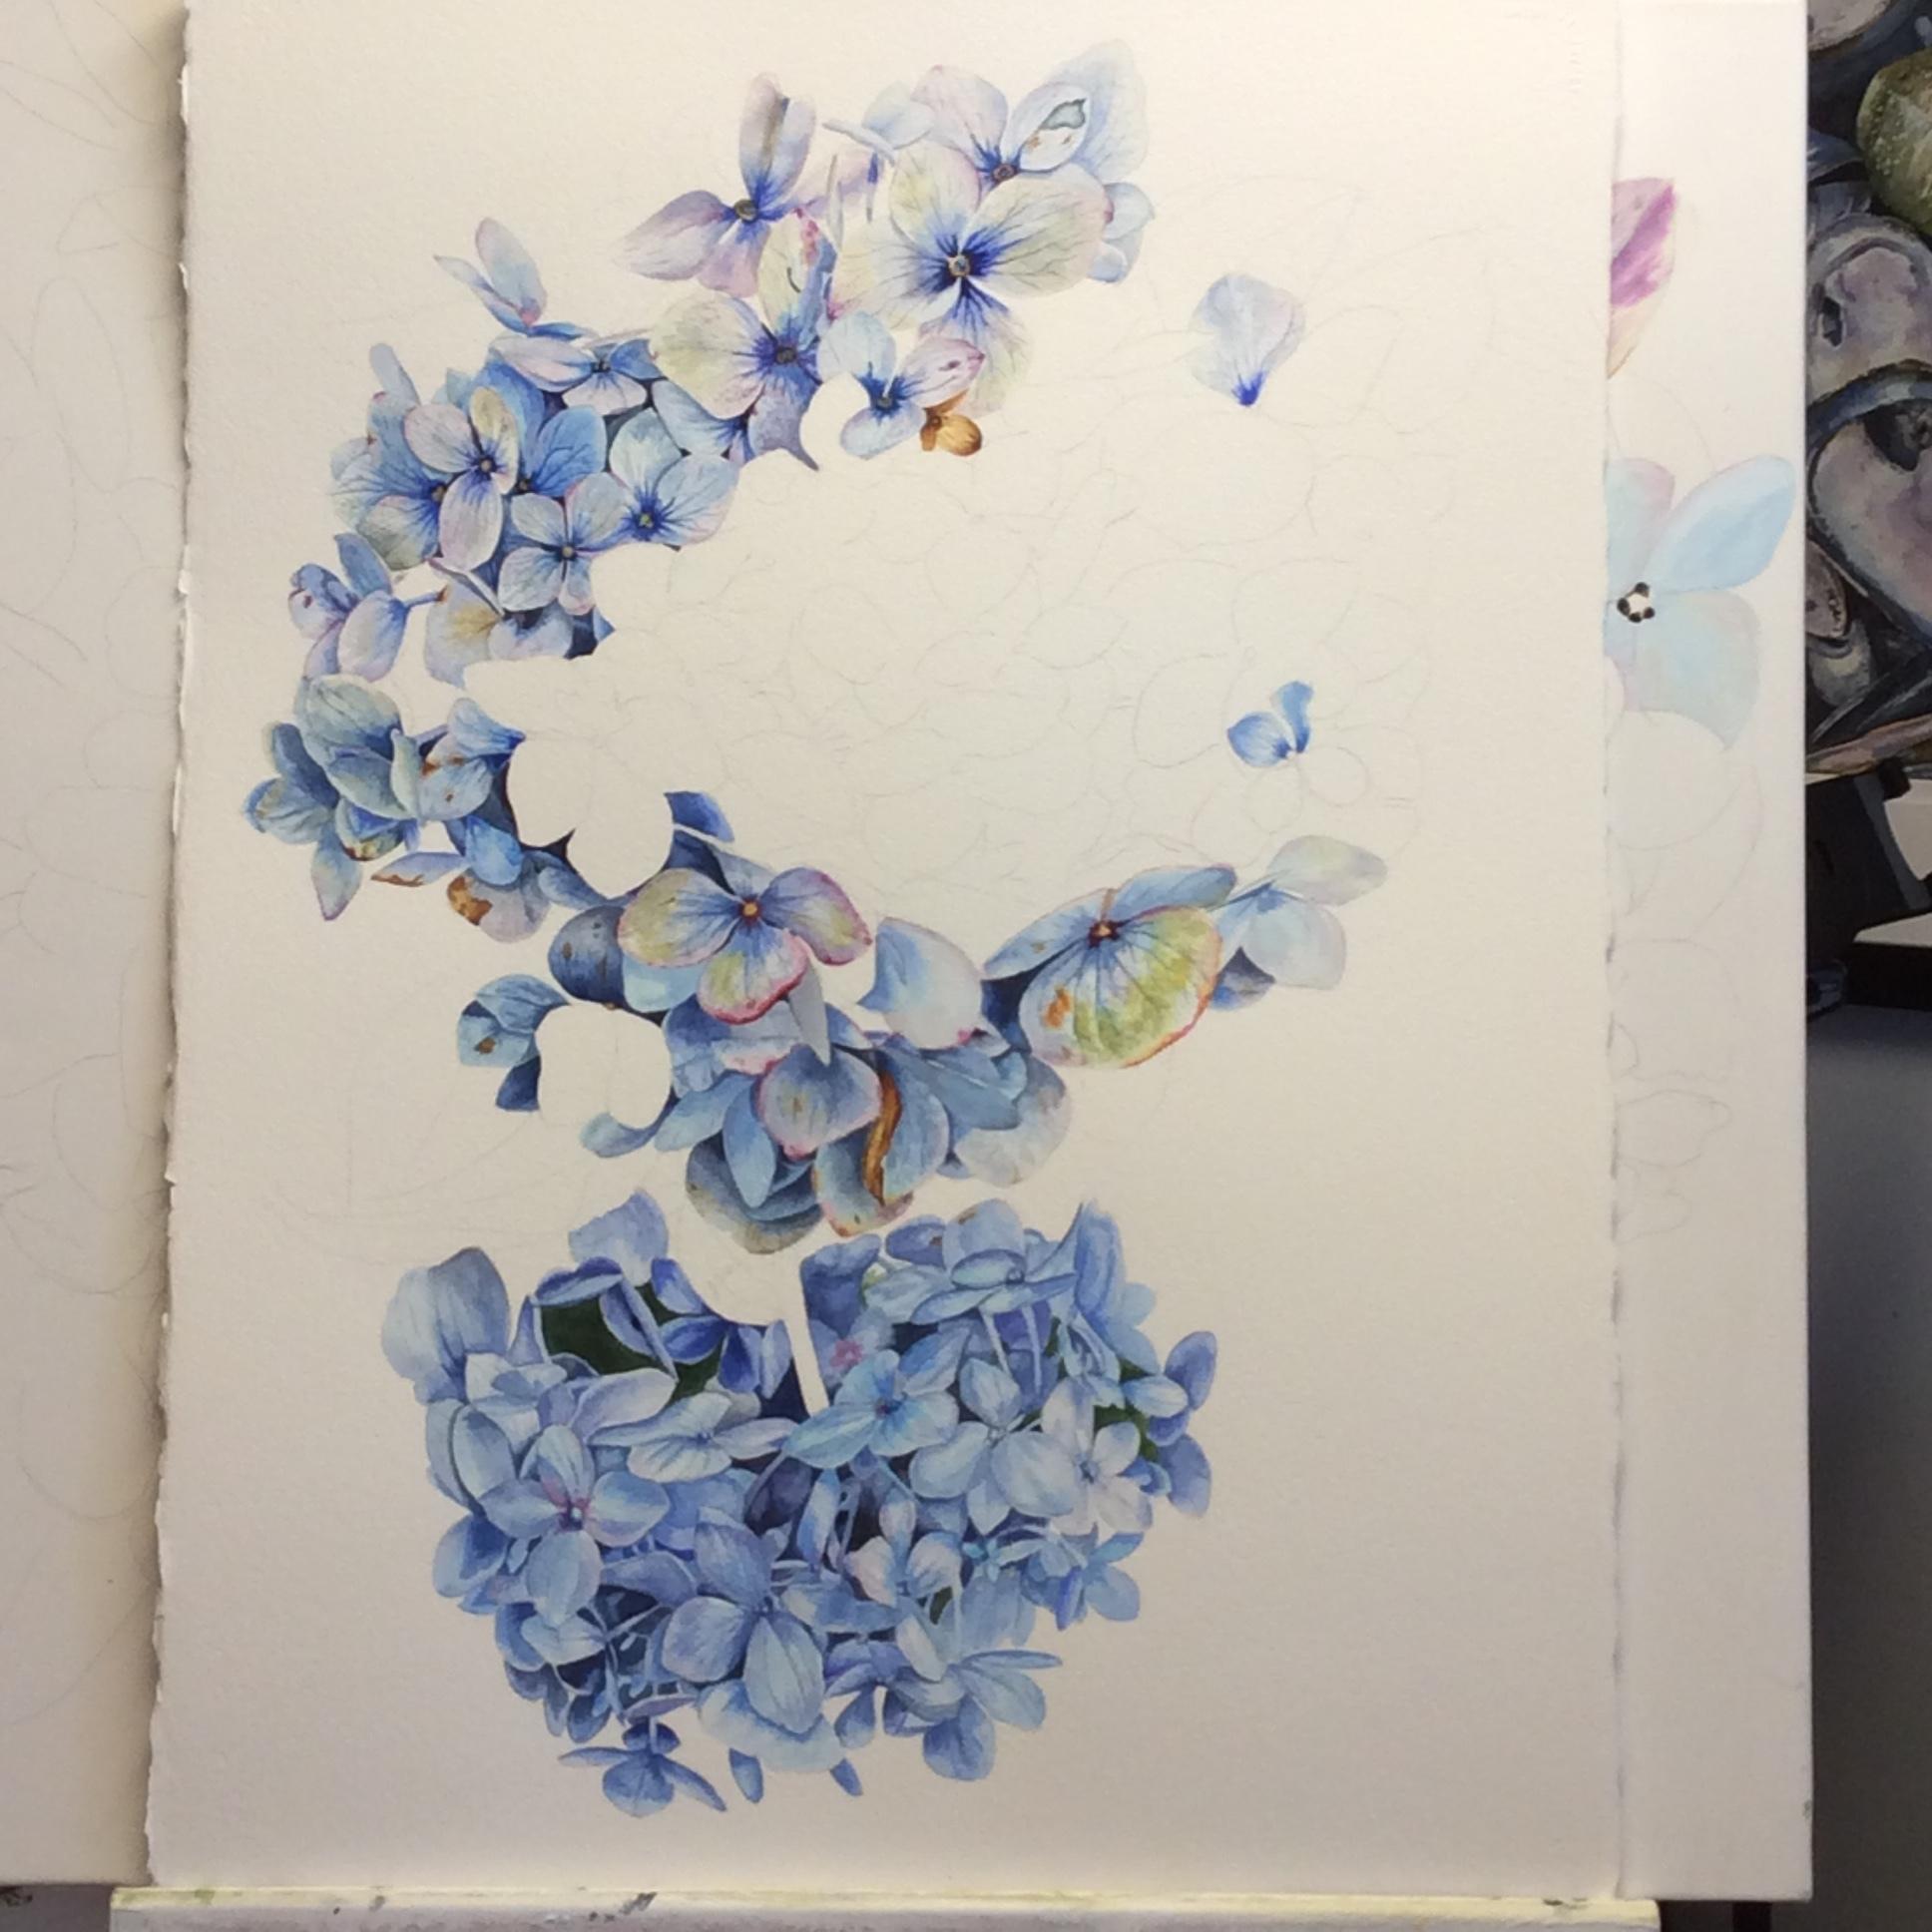 WIP Amethyst Shades of Blue by Helen Shideler